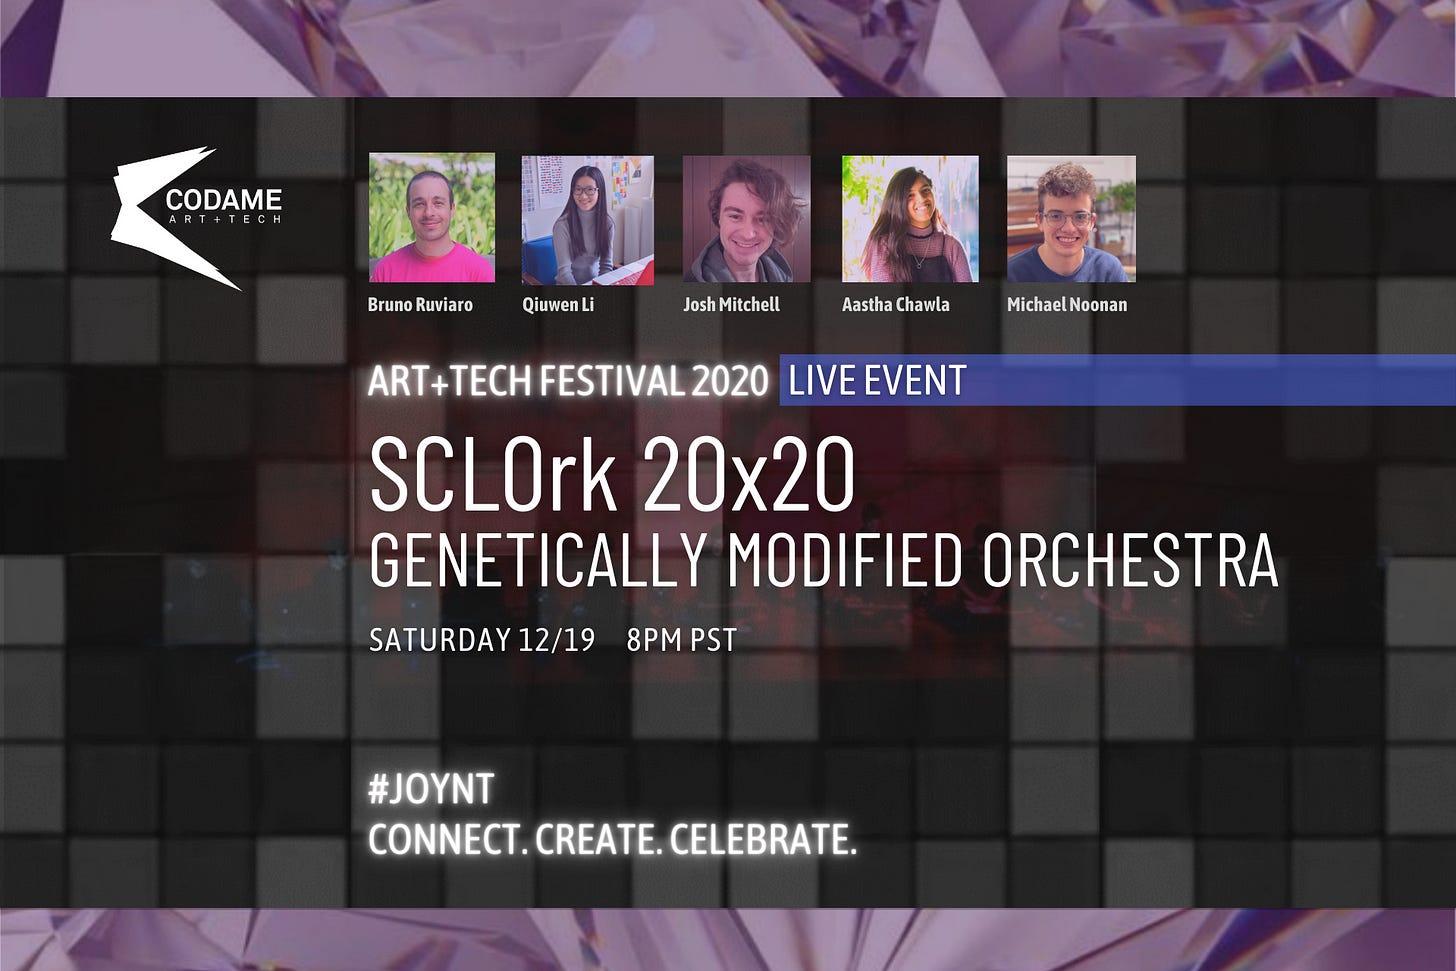 SCLOrk 20x20